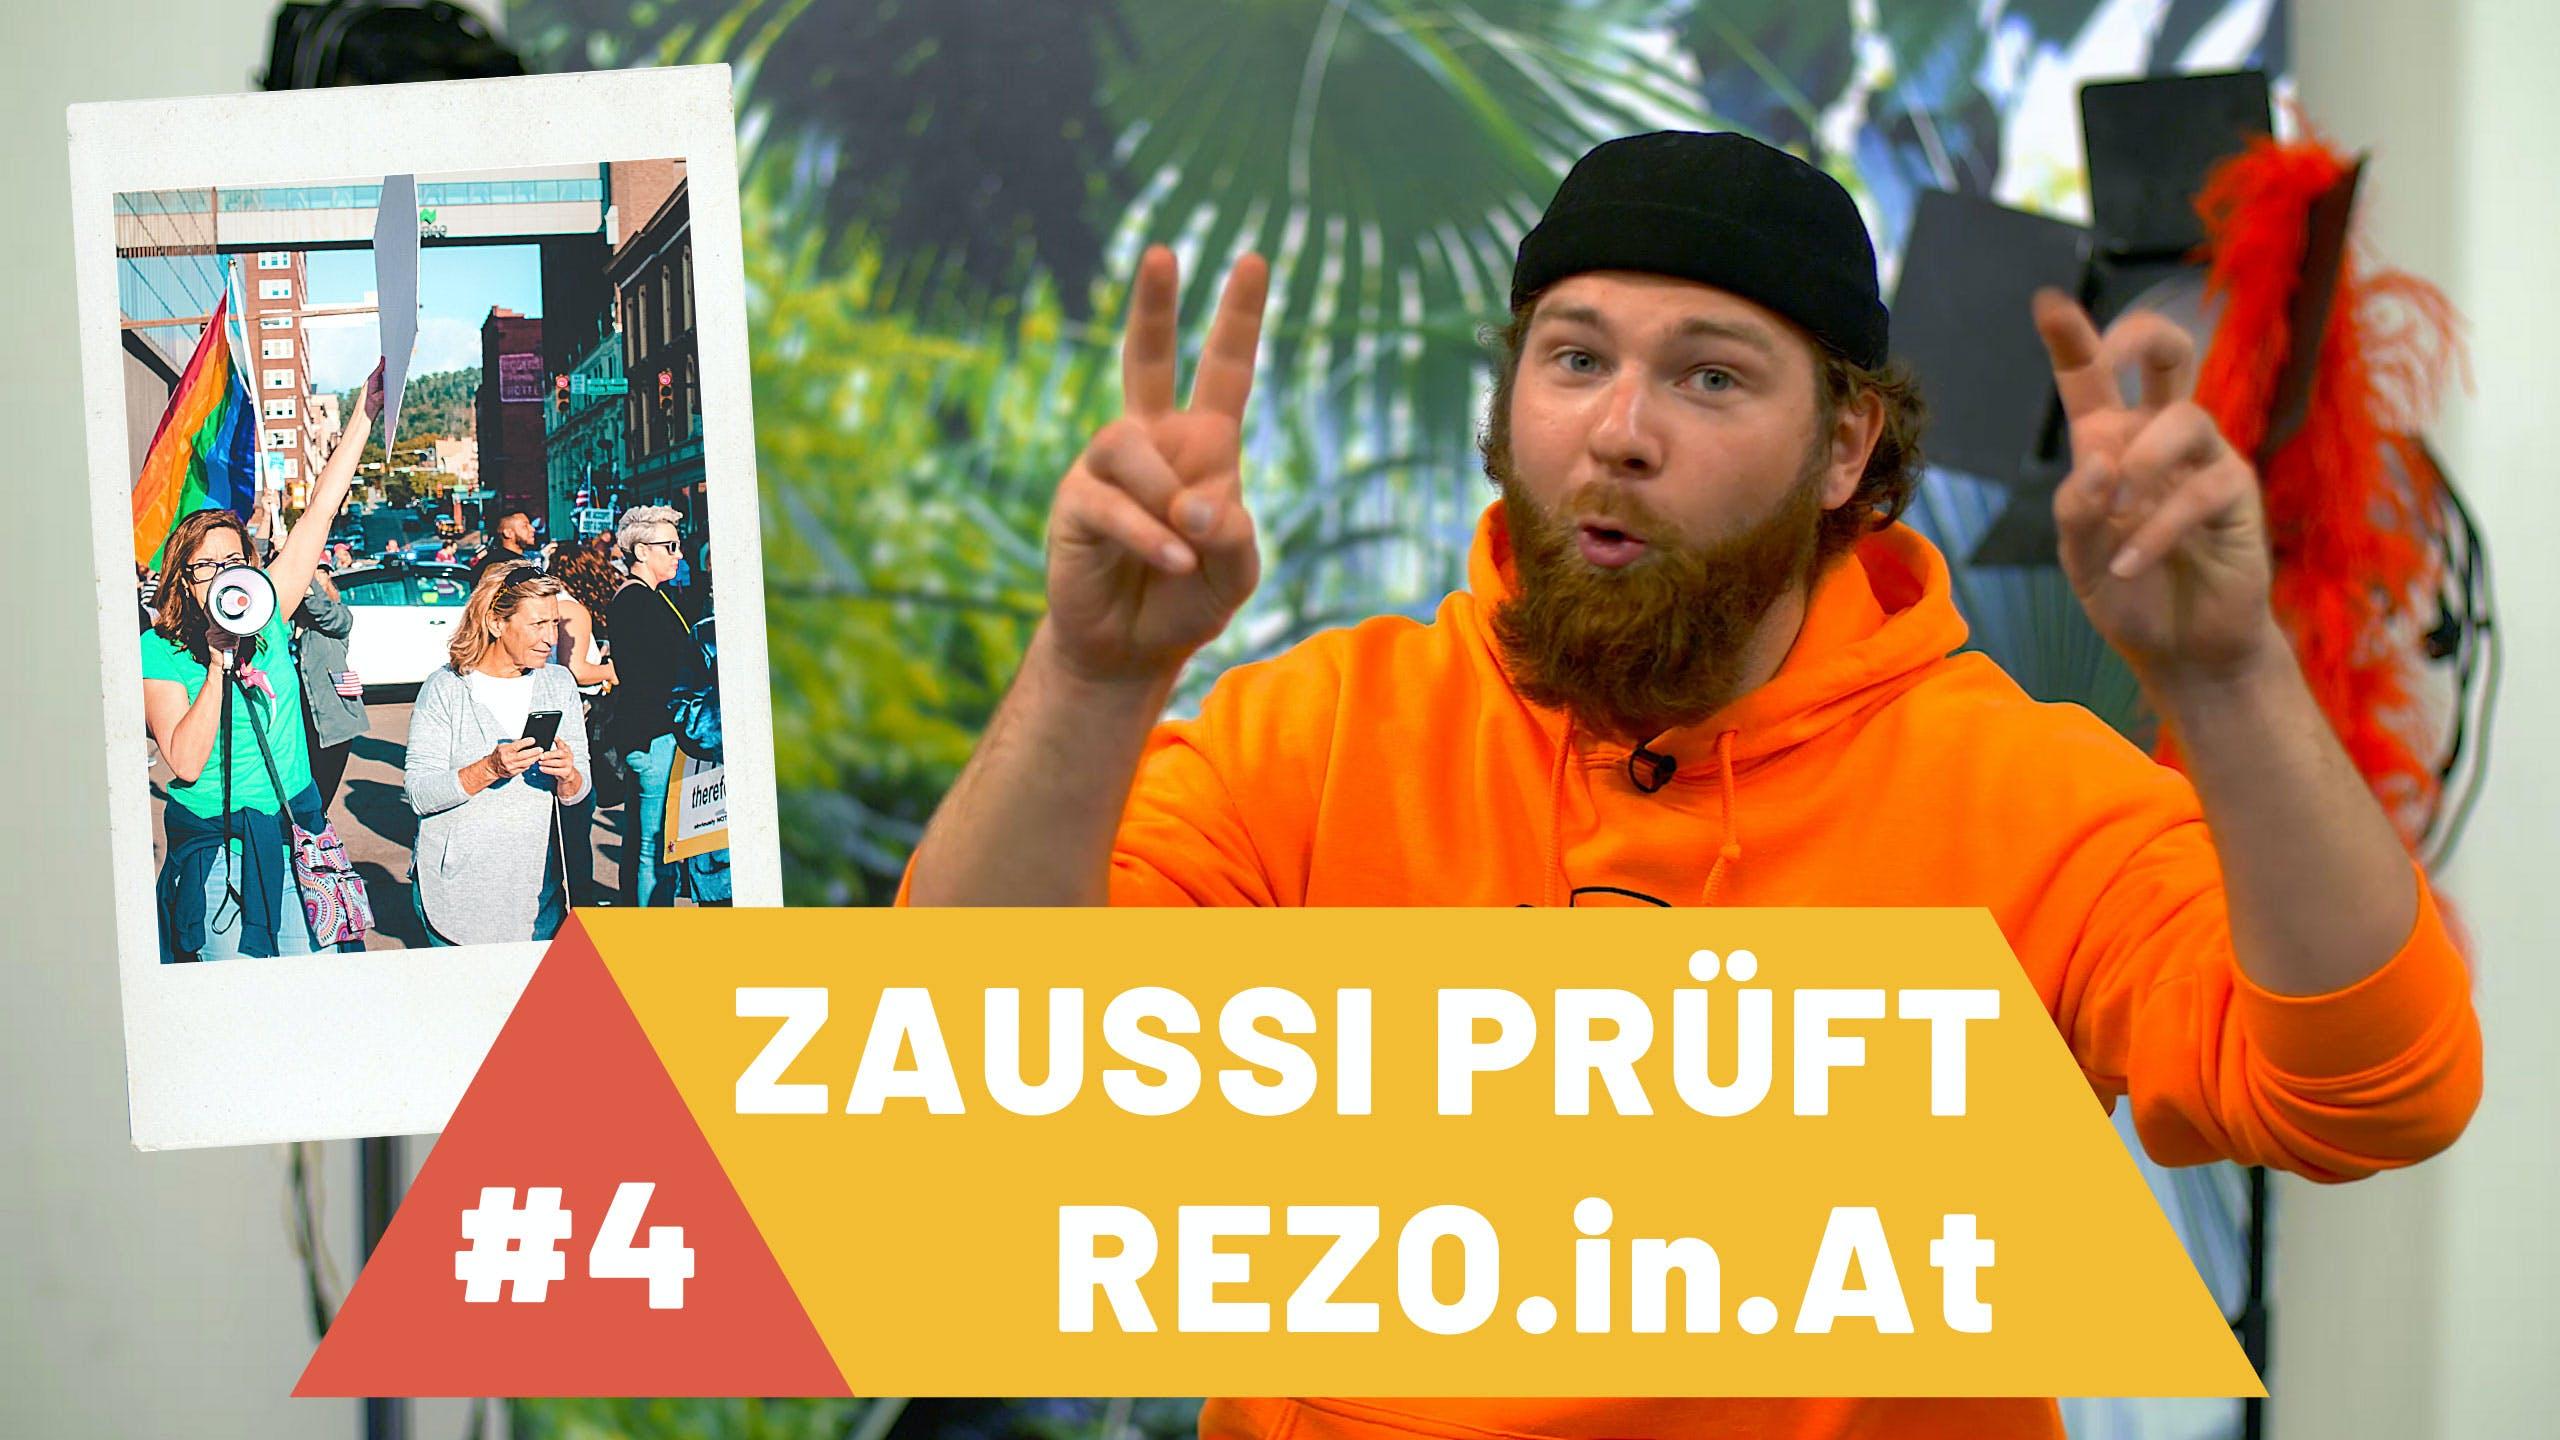 Zaussi prüft Rezo: DISKREDITIERUNG